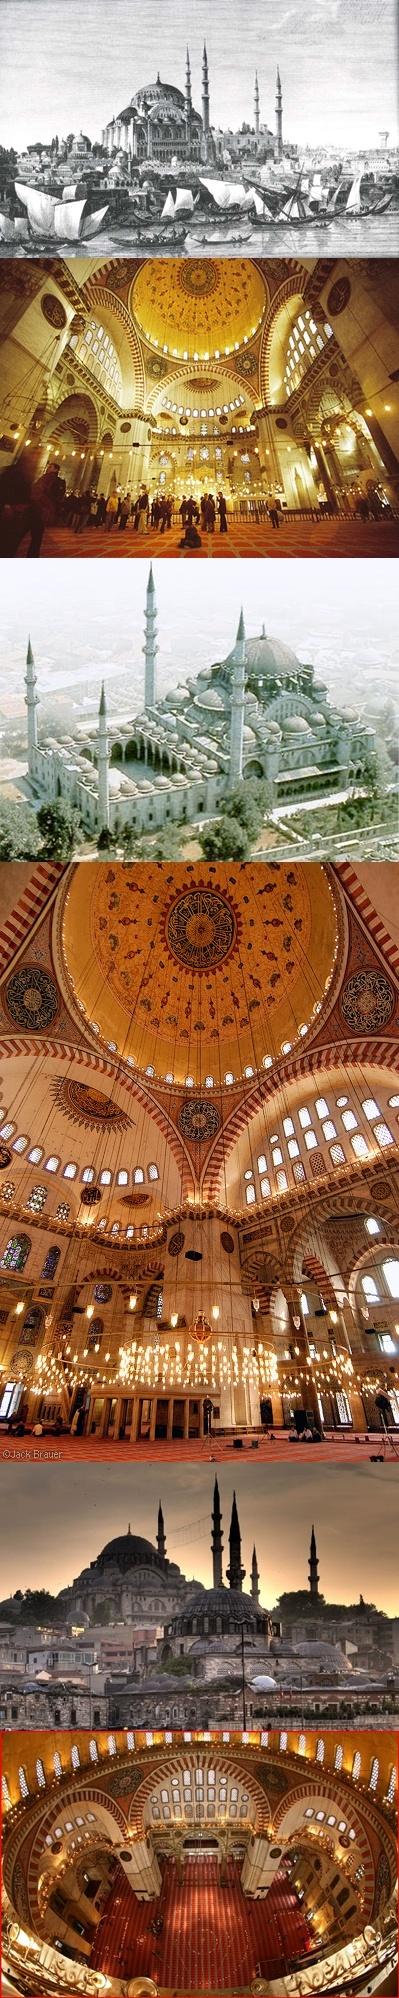 Süleymaniye Mosque and Külliye